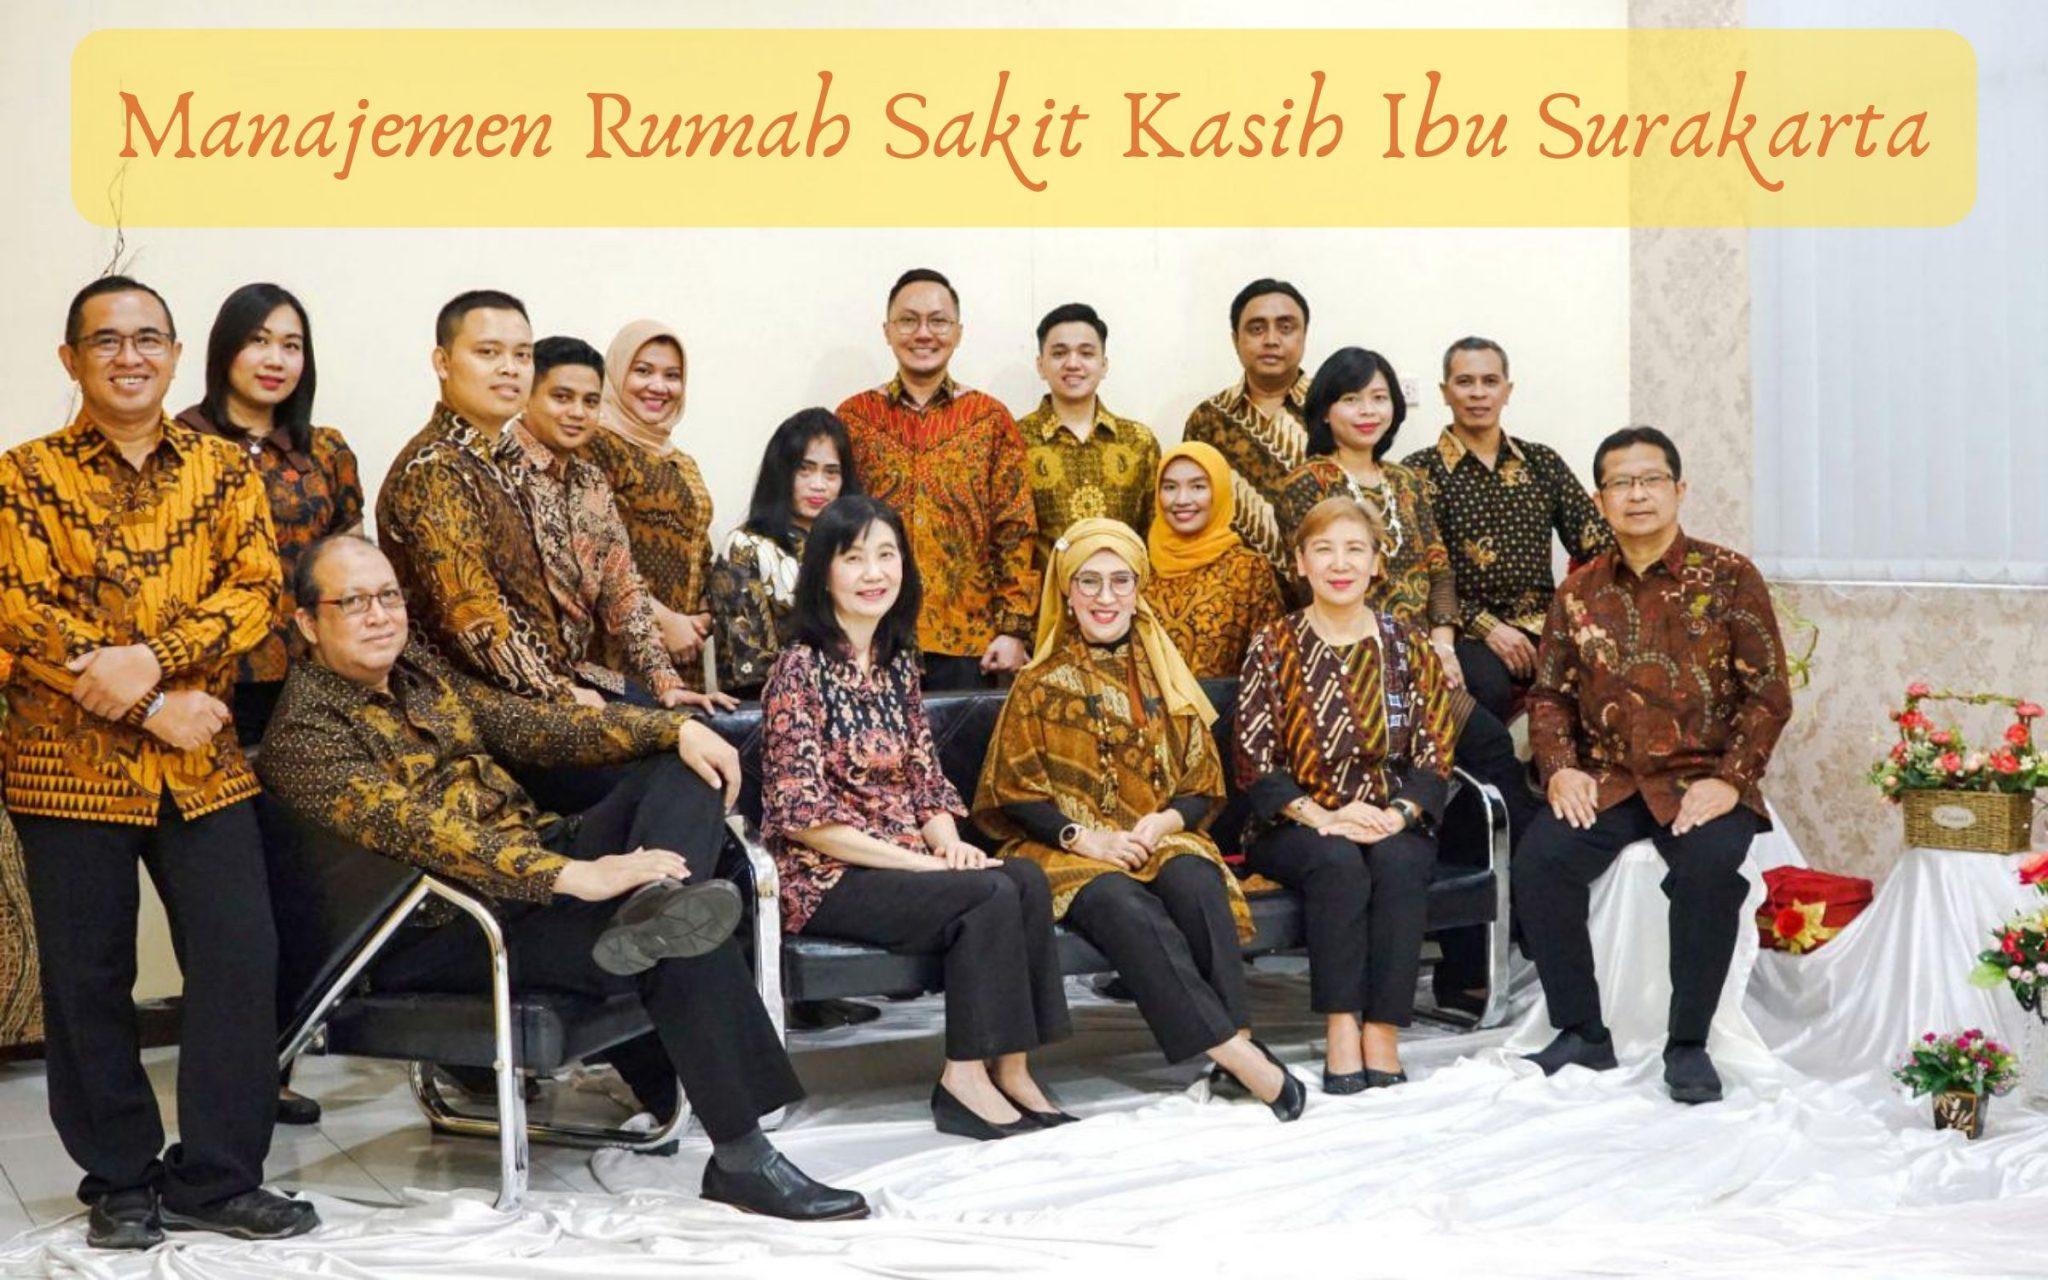 Manajemen Rumah Sakit Kasih Ibu Surakarta